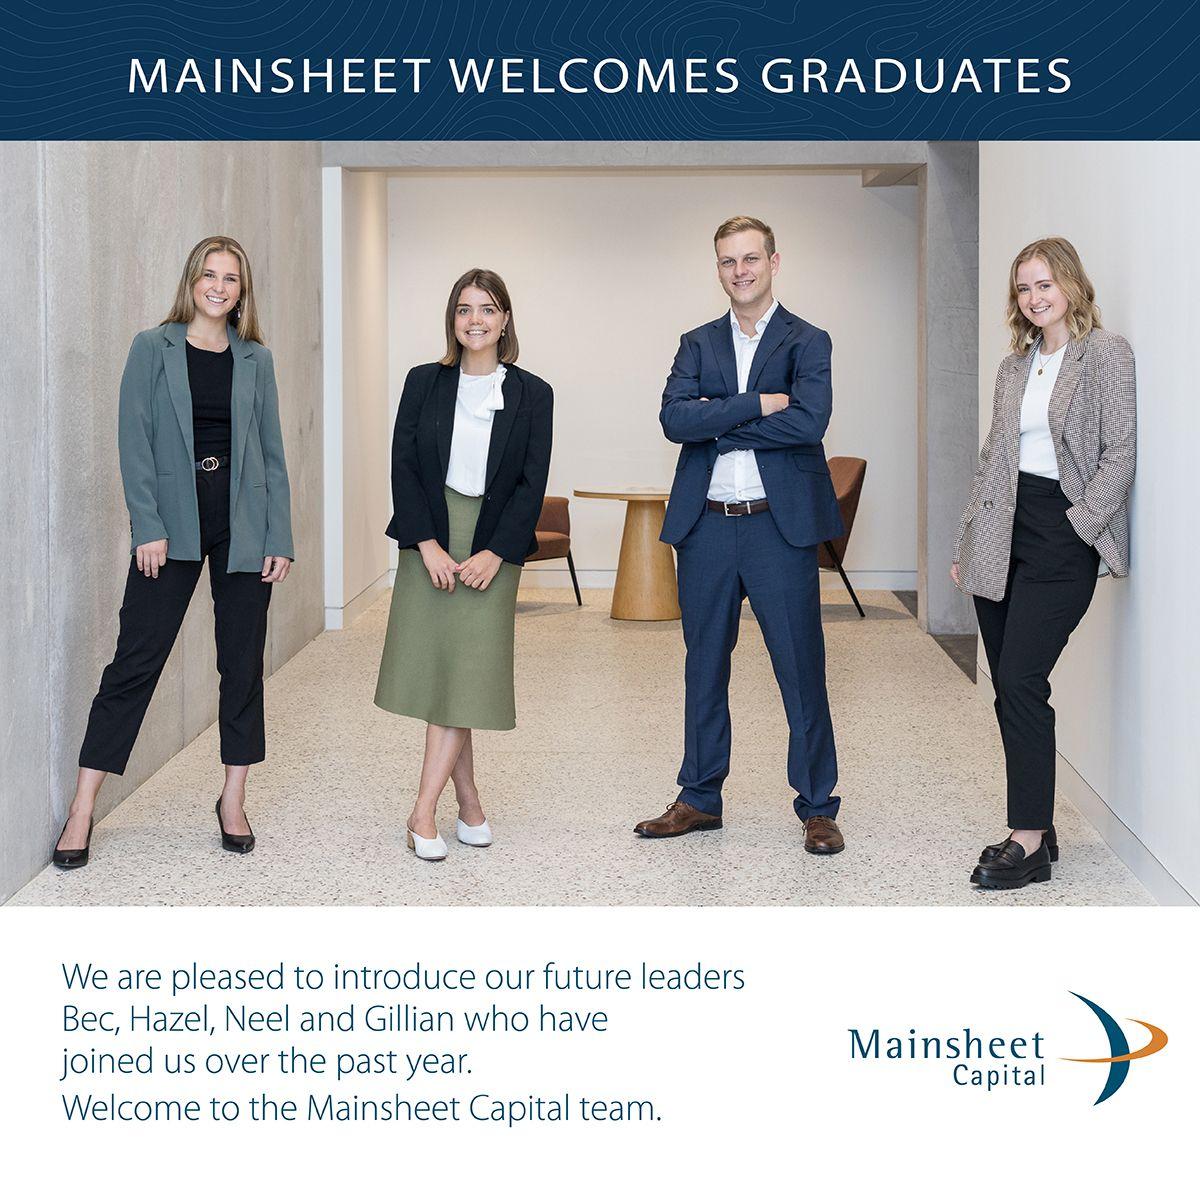 Mainsheet welcomes new Graduates